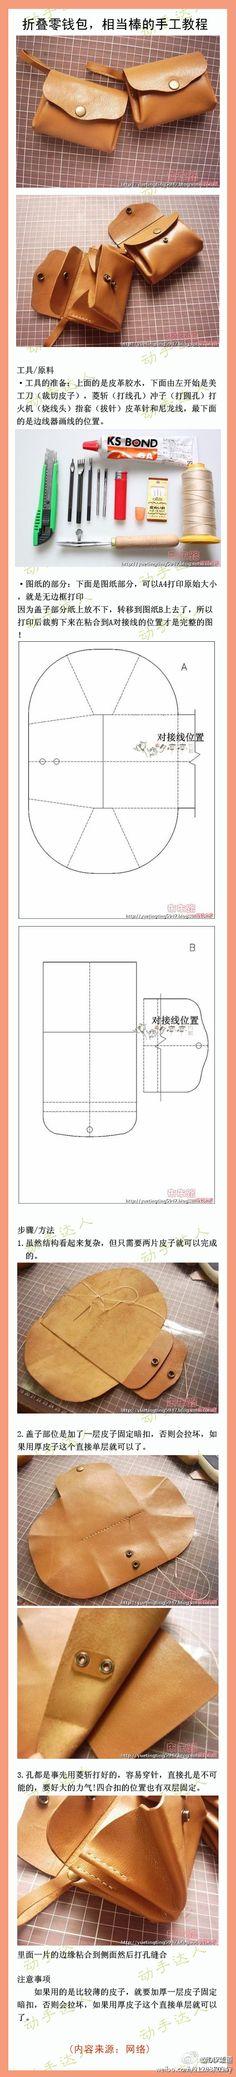 Japanese pouch purse tutorial